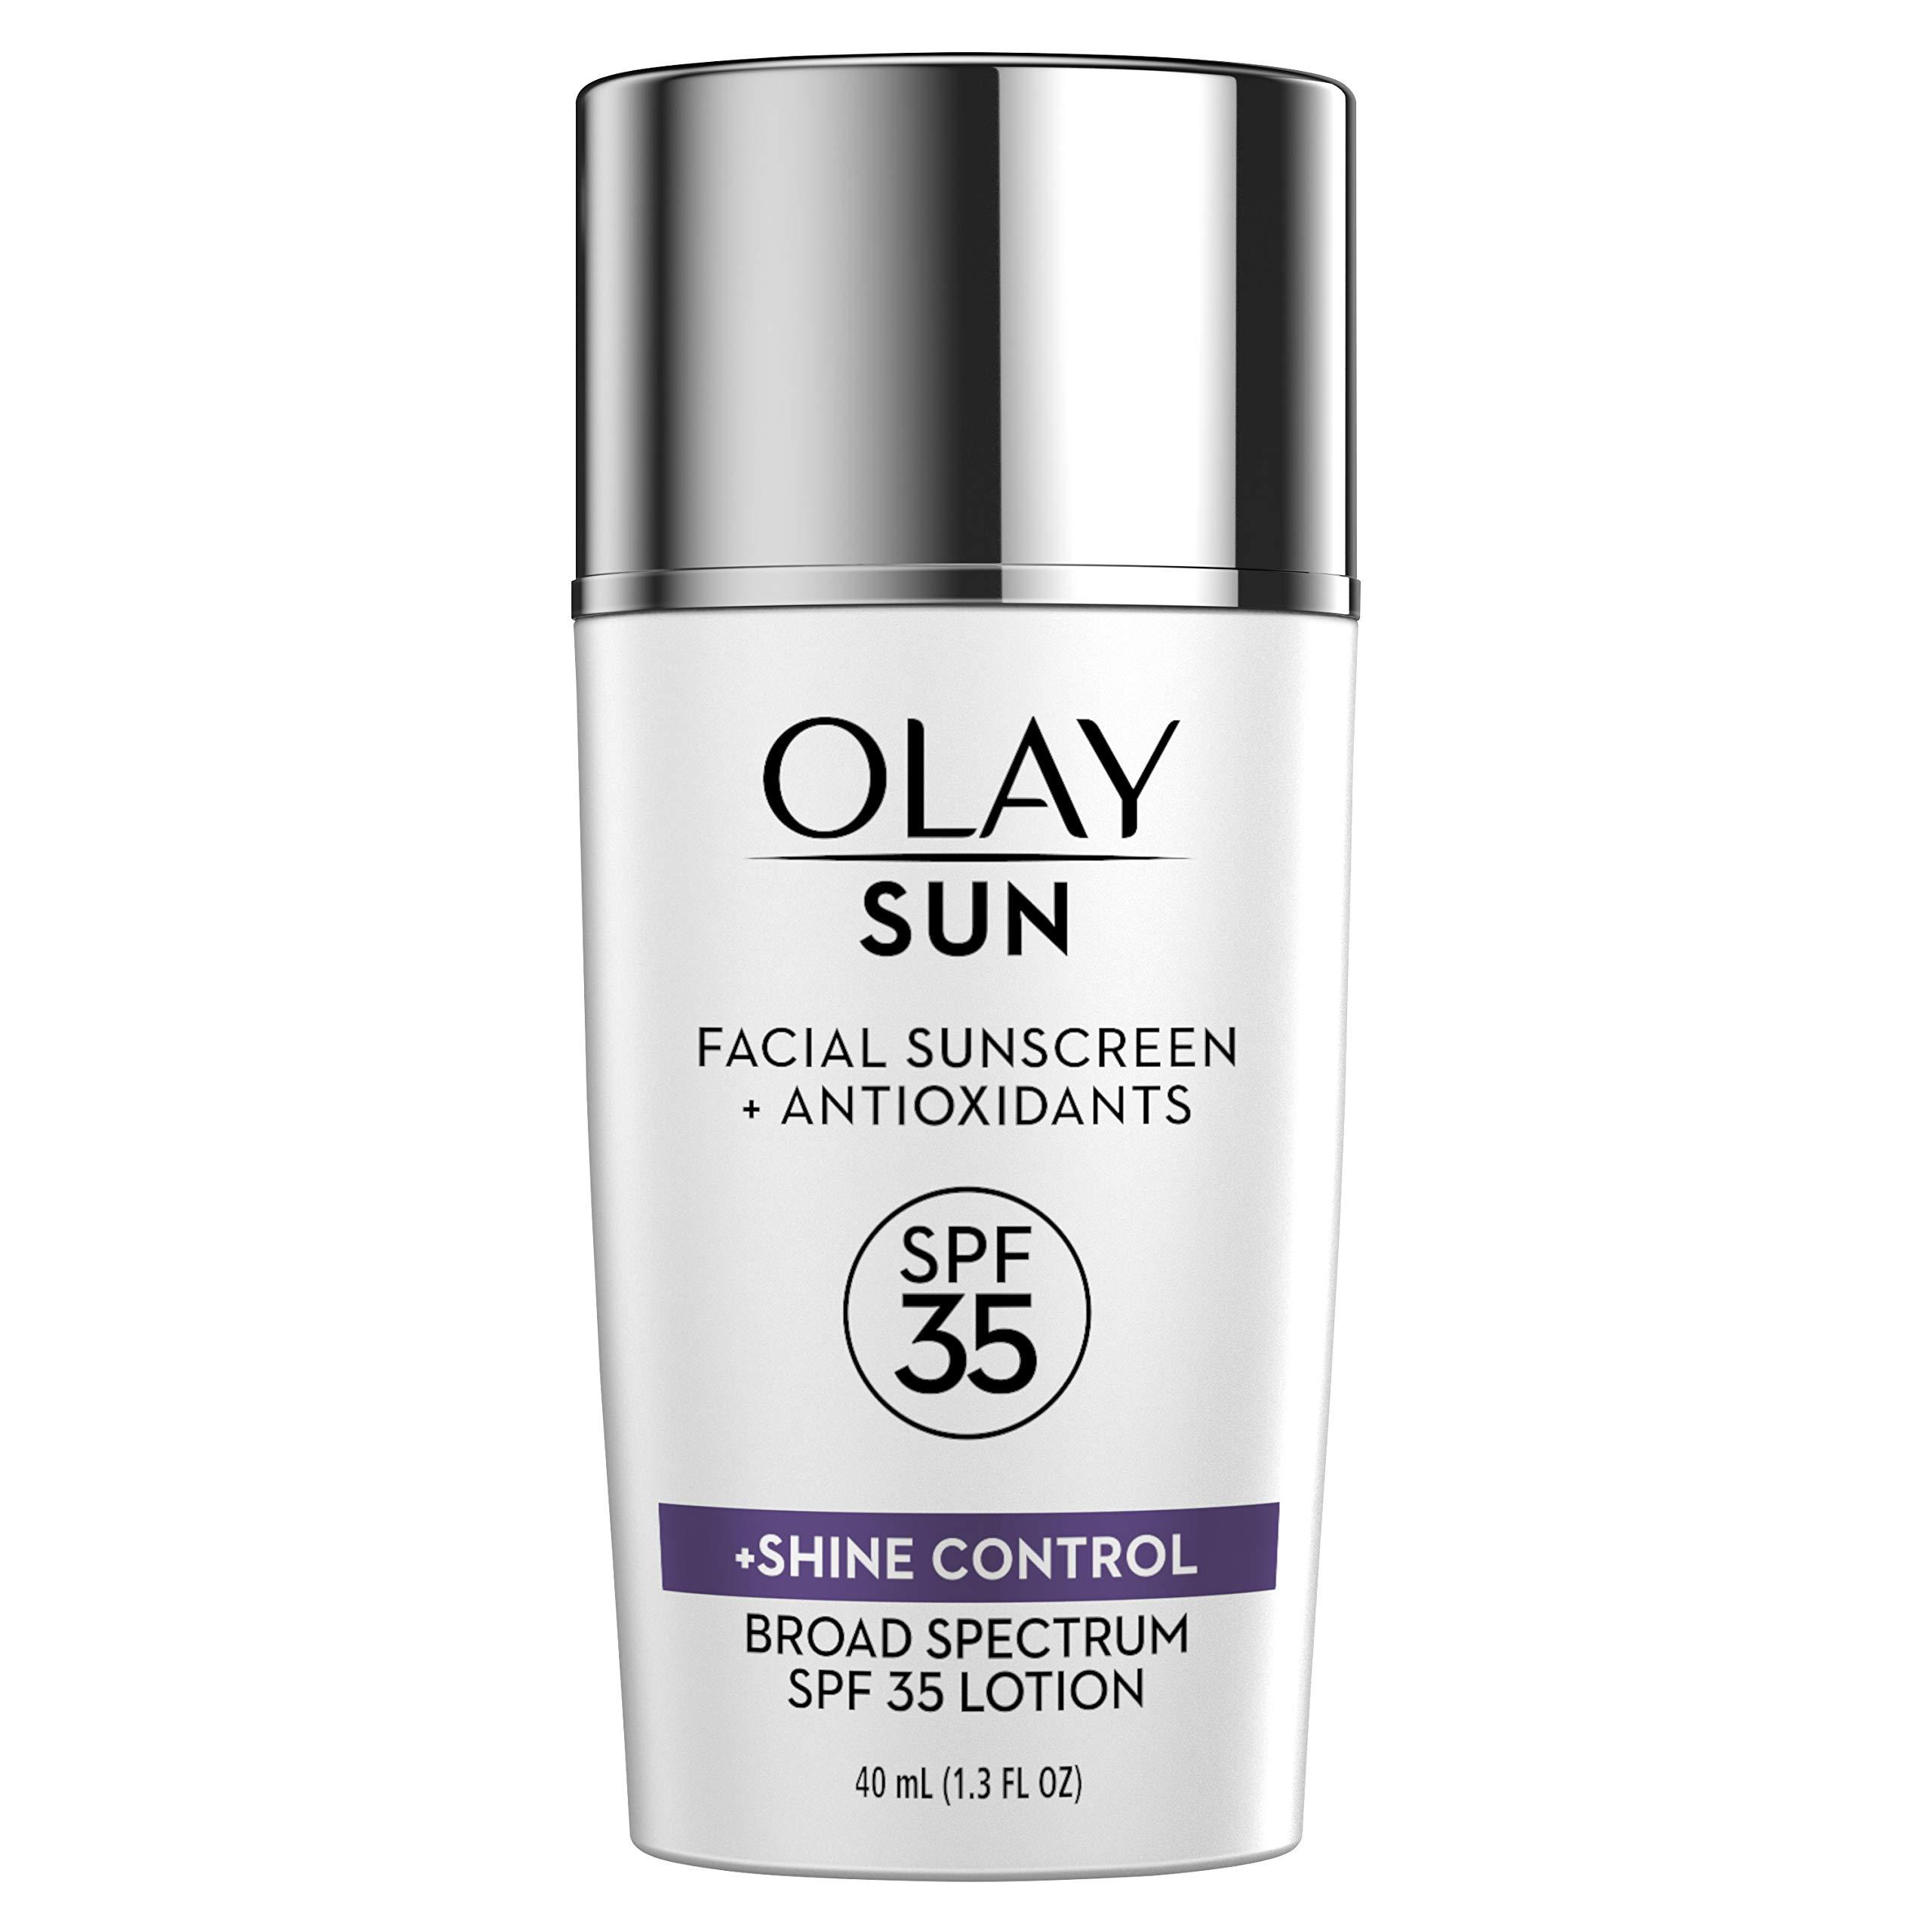 Facial Sunscreen and Antioxidants by Olay Sun, SPF 35 Face Lotion + Shine Control, 1.3 Fl Oz